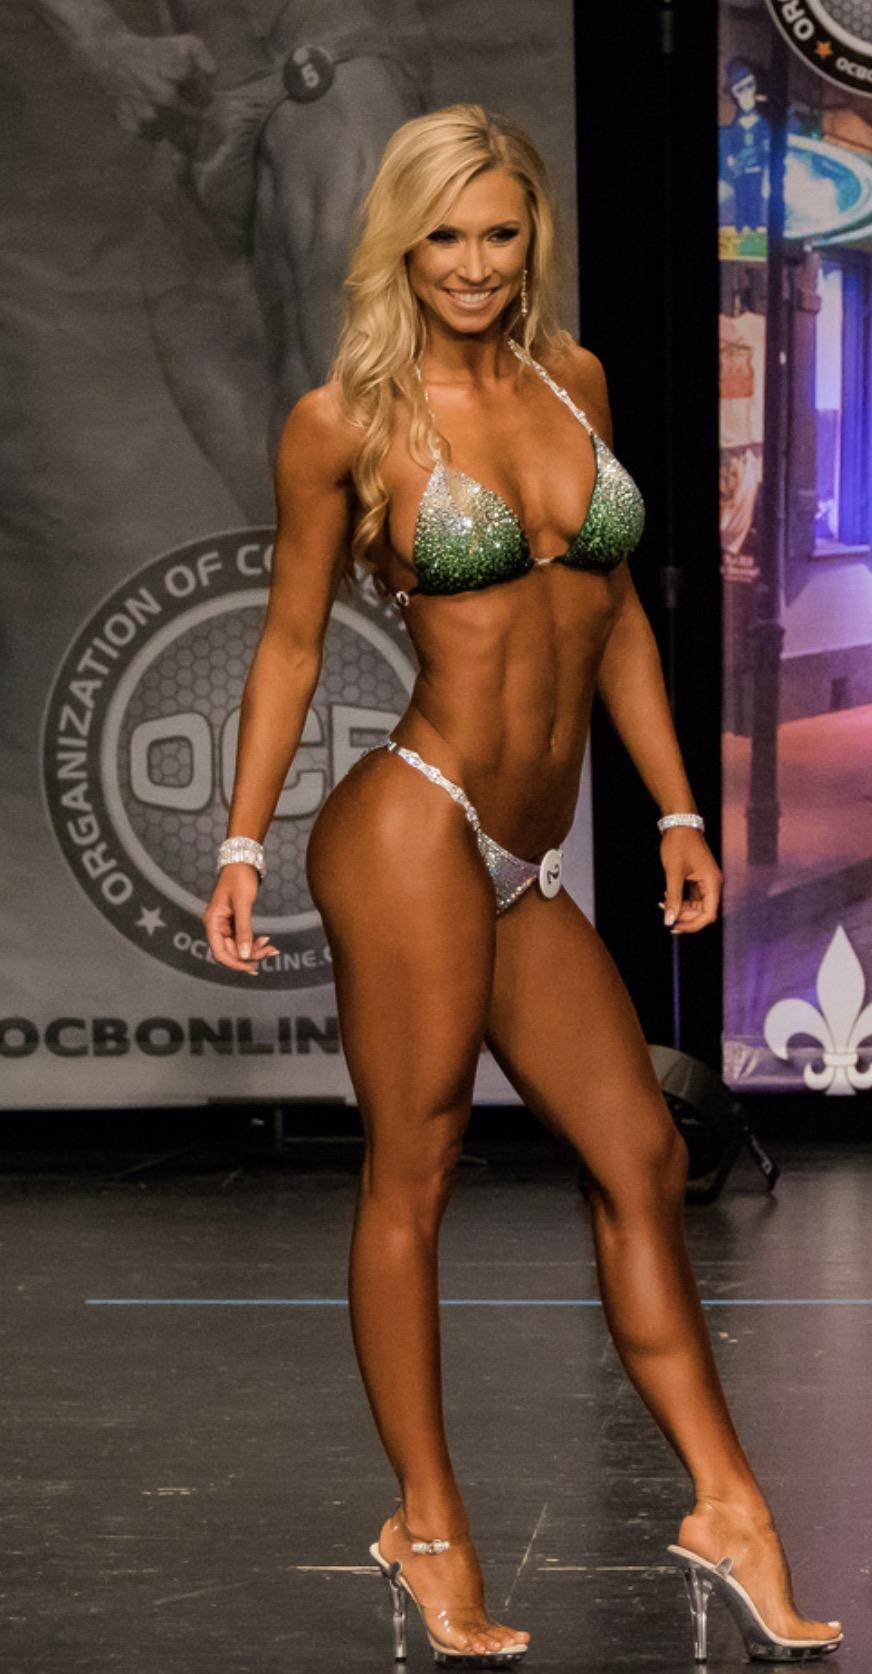 Allison Cameron Sexy natural bodybuilding contests | physique contests